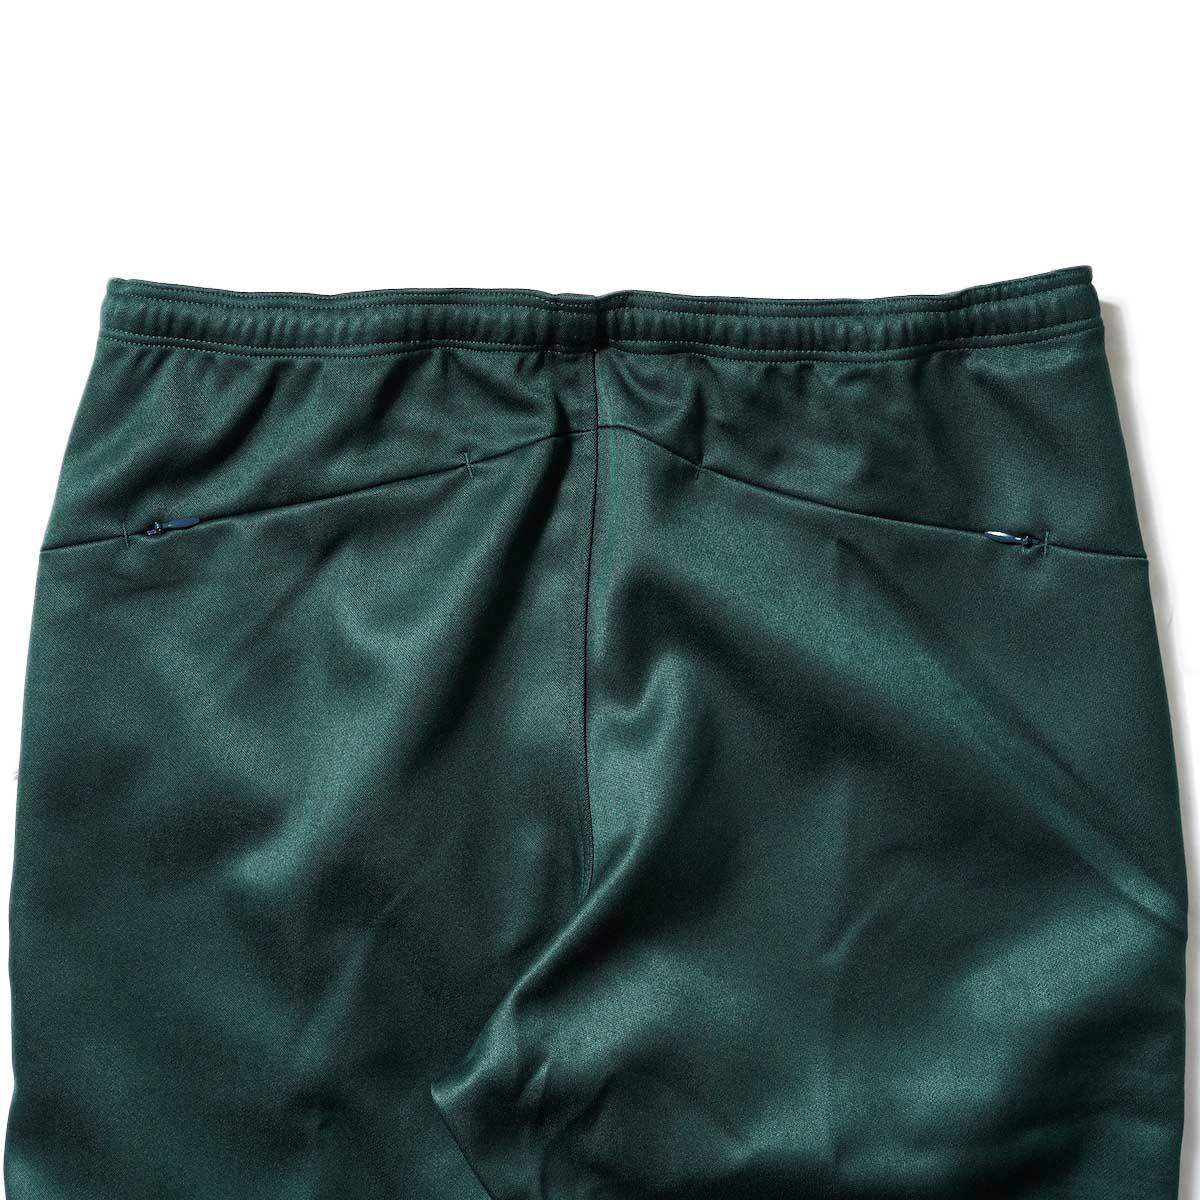 Needles / W.U. BOOT-CUT PANT - PE/R DOESKIN (Green)ヒップポケット